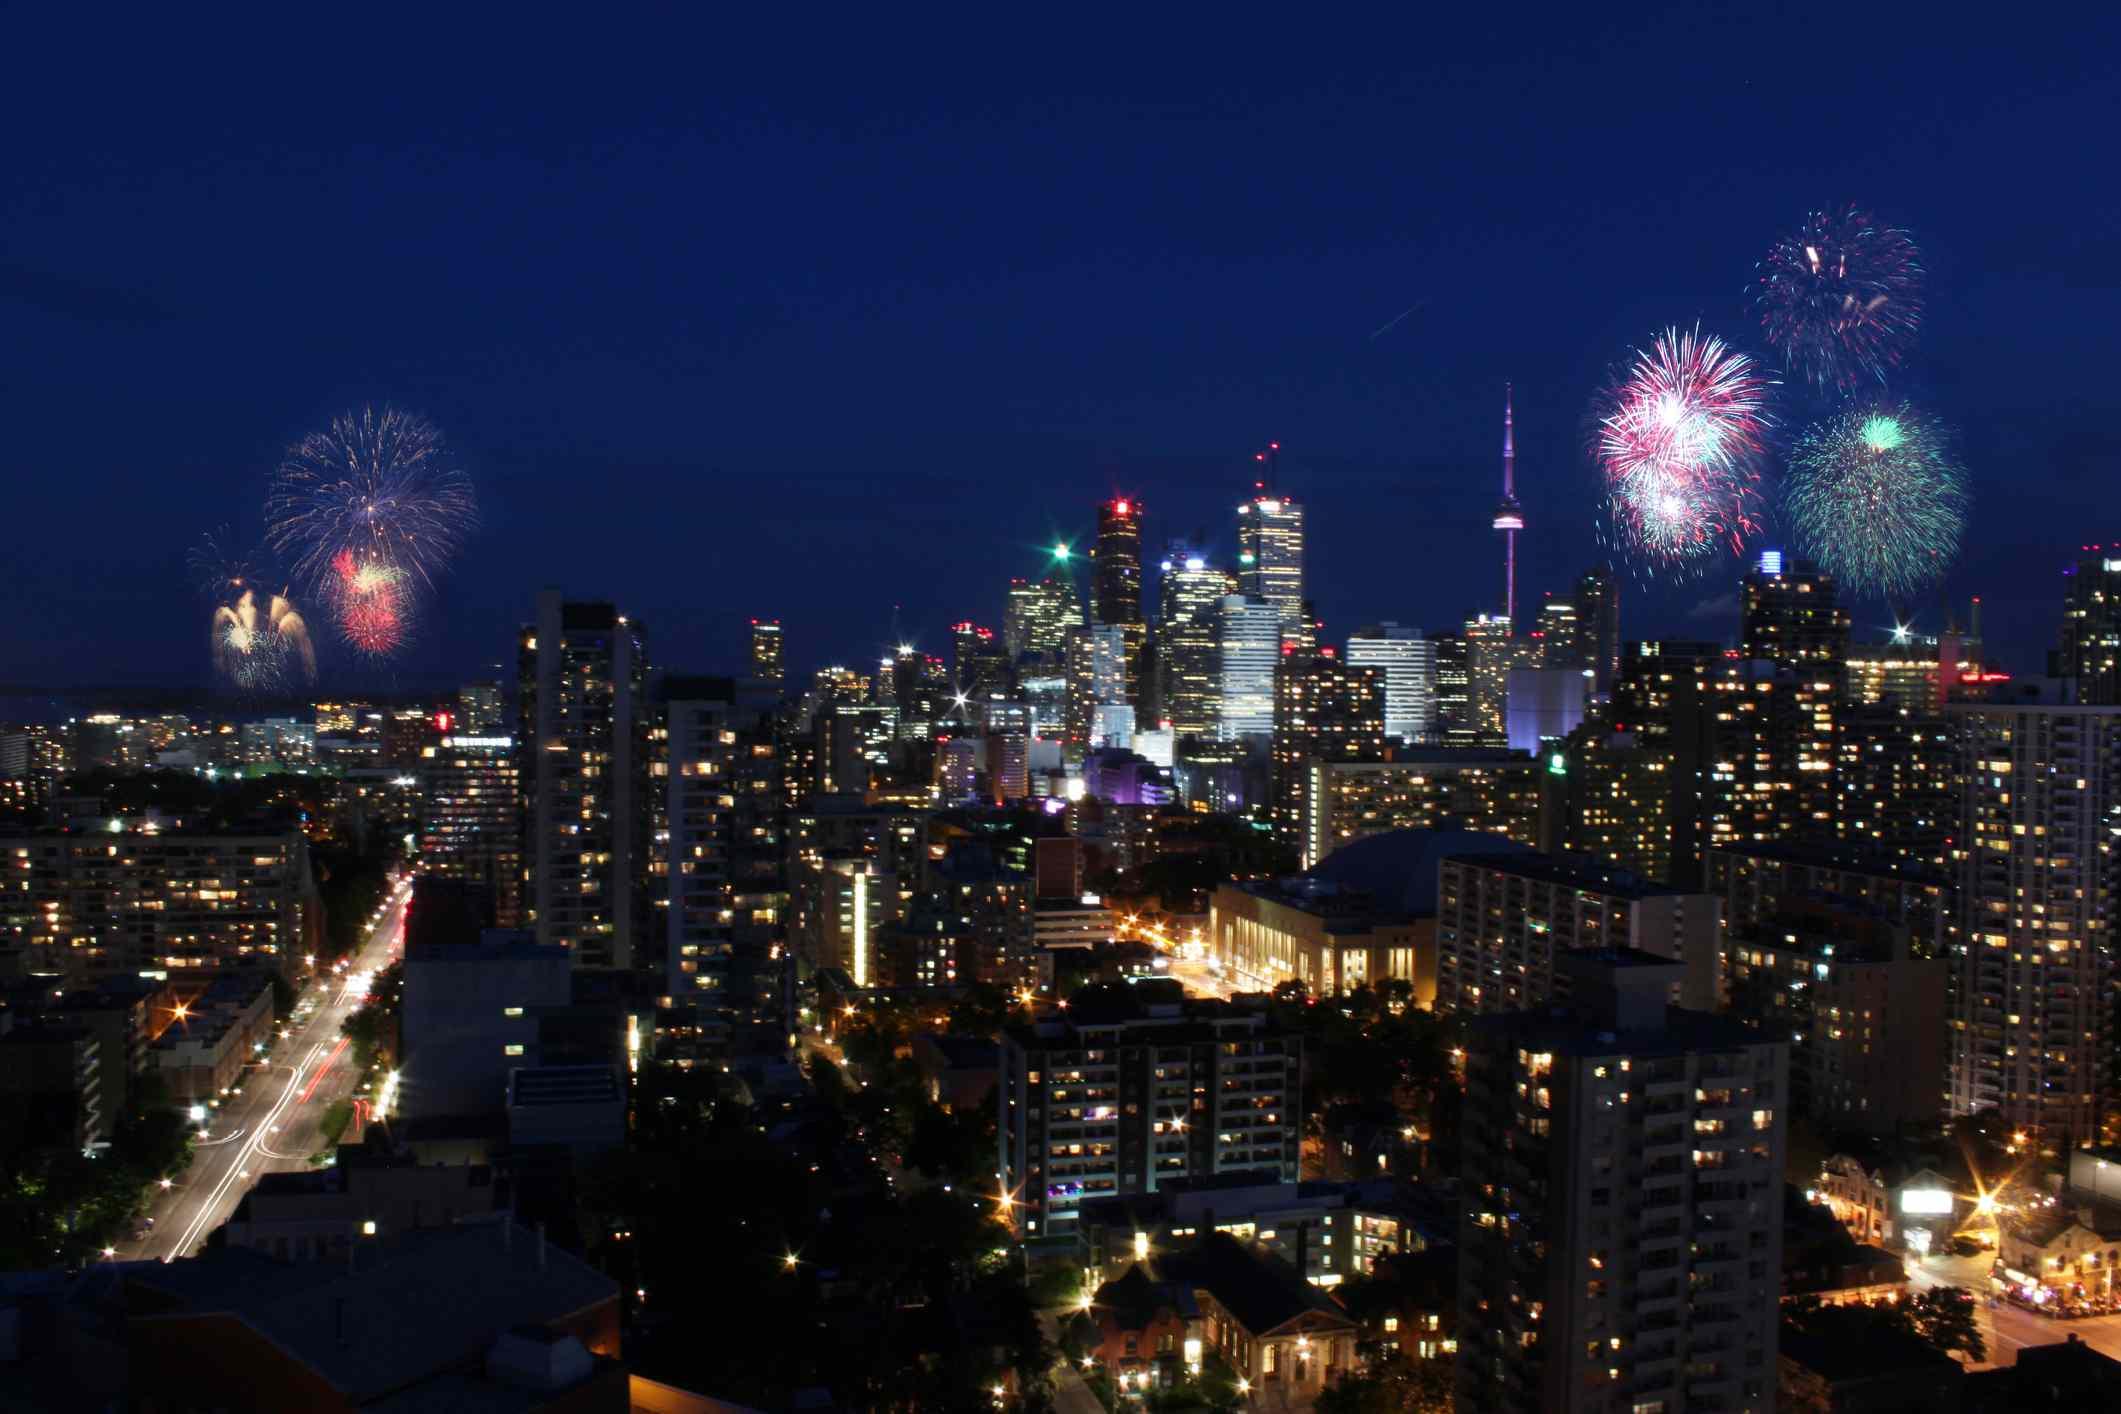 Victoria Day fireworks celebrations in Toronto, Ontario